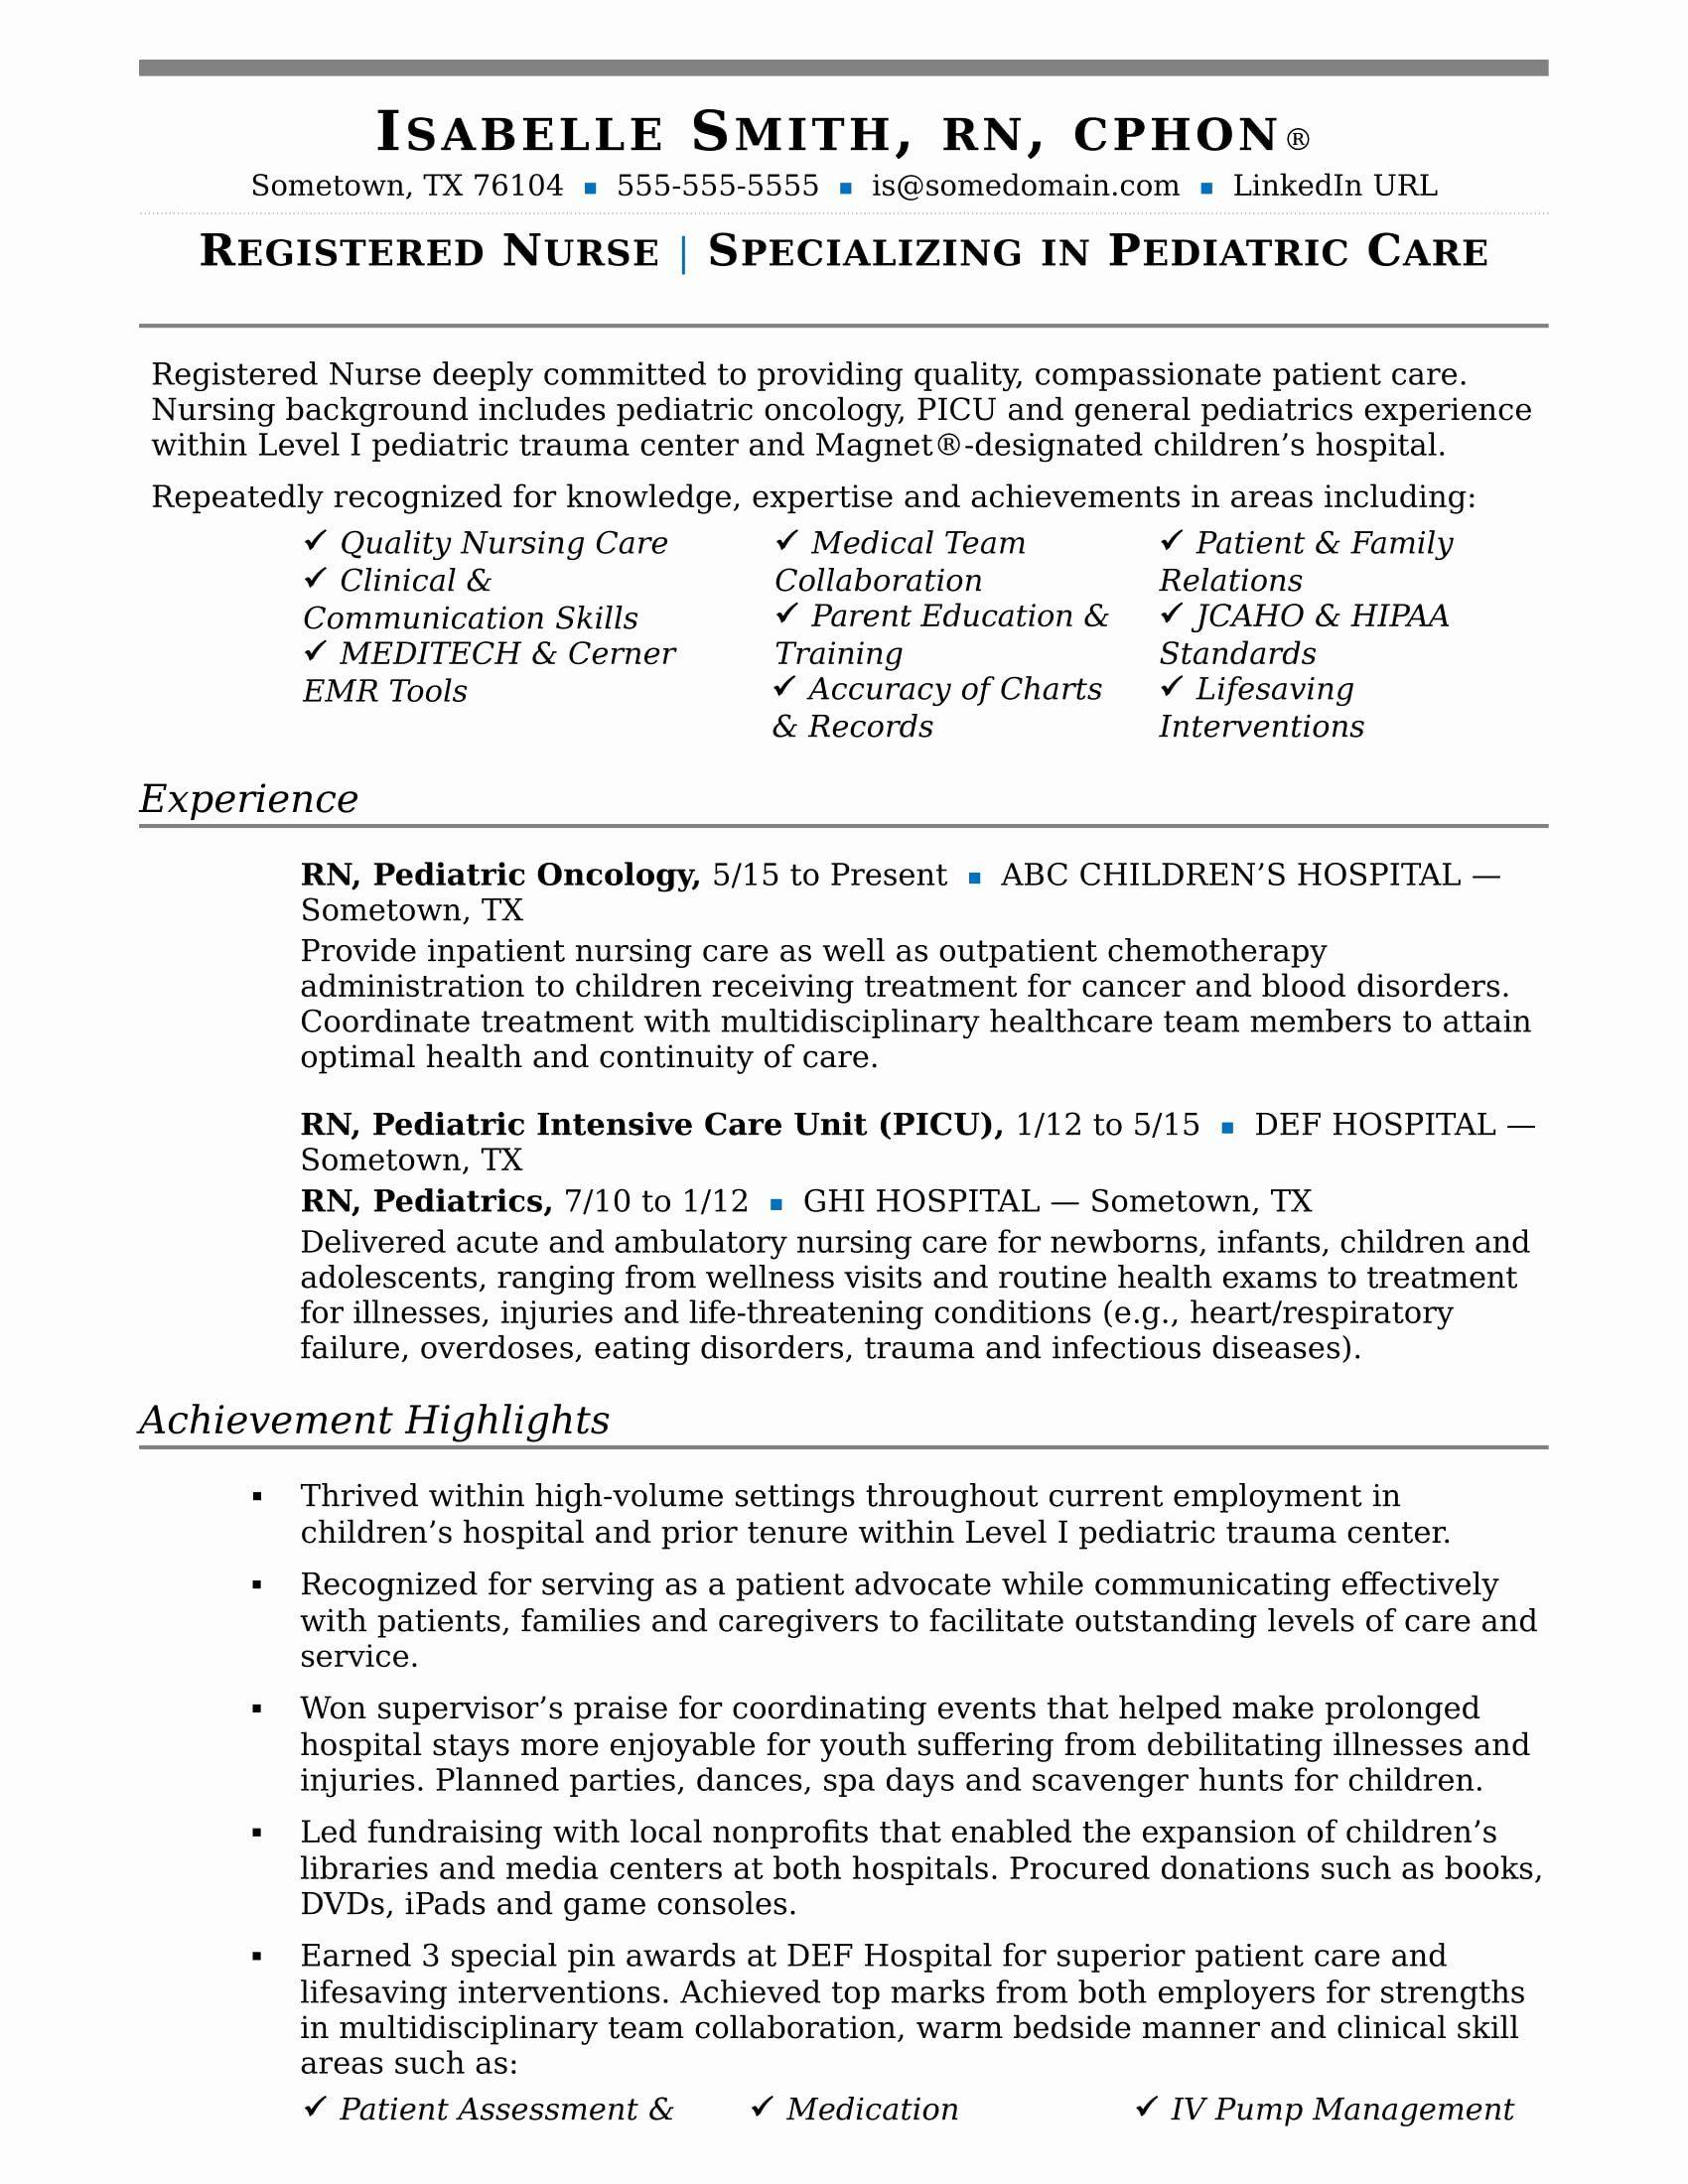 Nurse Skills For Resume Elegant Nurse Resume Sample Nursing Resume Examples Registered Nurse Resume Nursing Resume Template